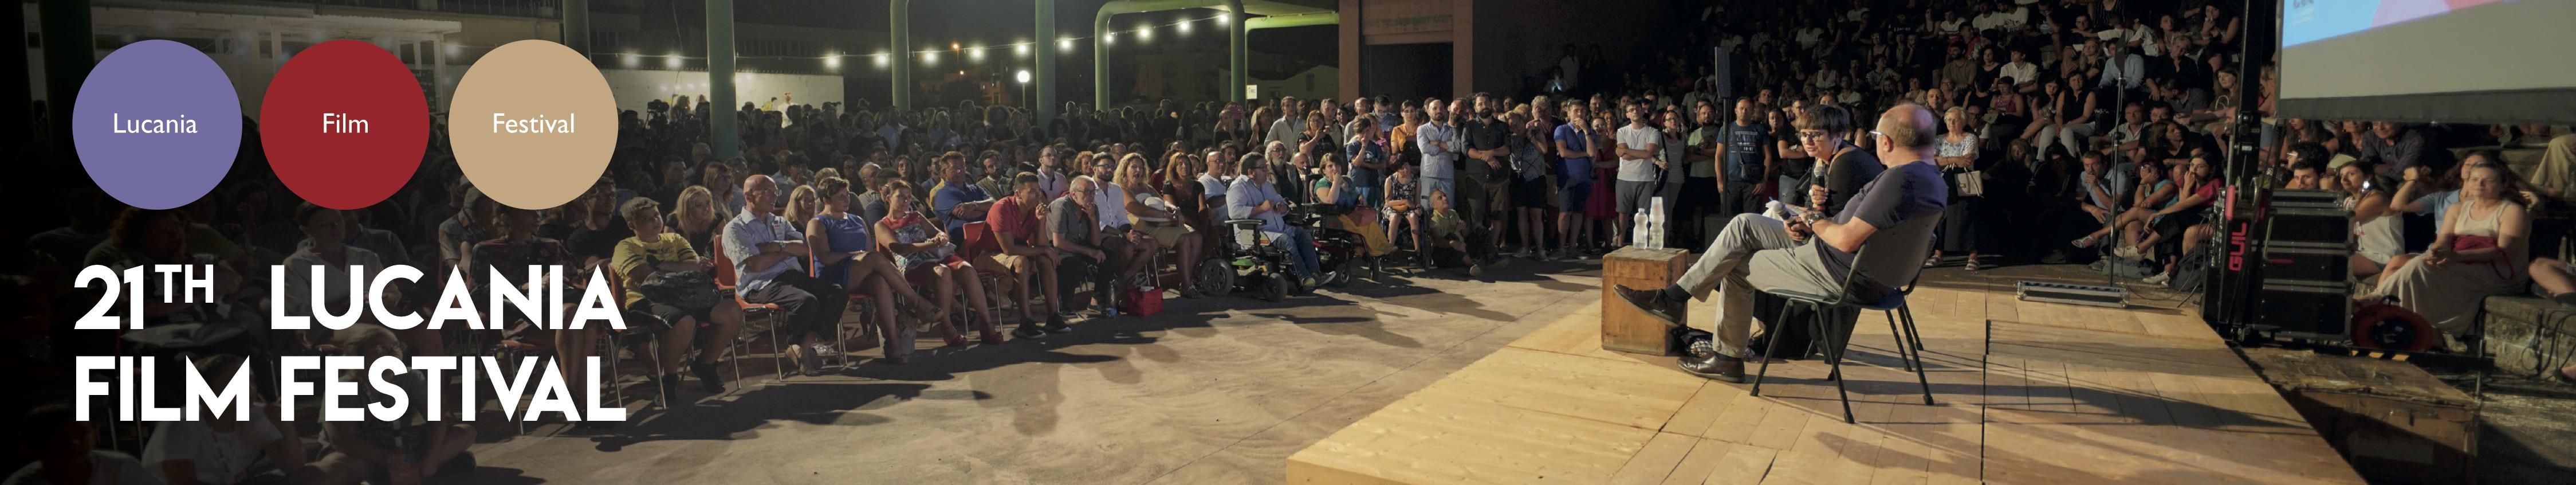 21th Lucania Film Festival · Pisticci · Matera 2019· Southern Italy